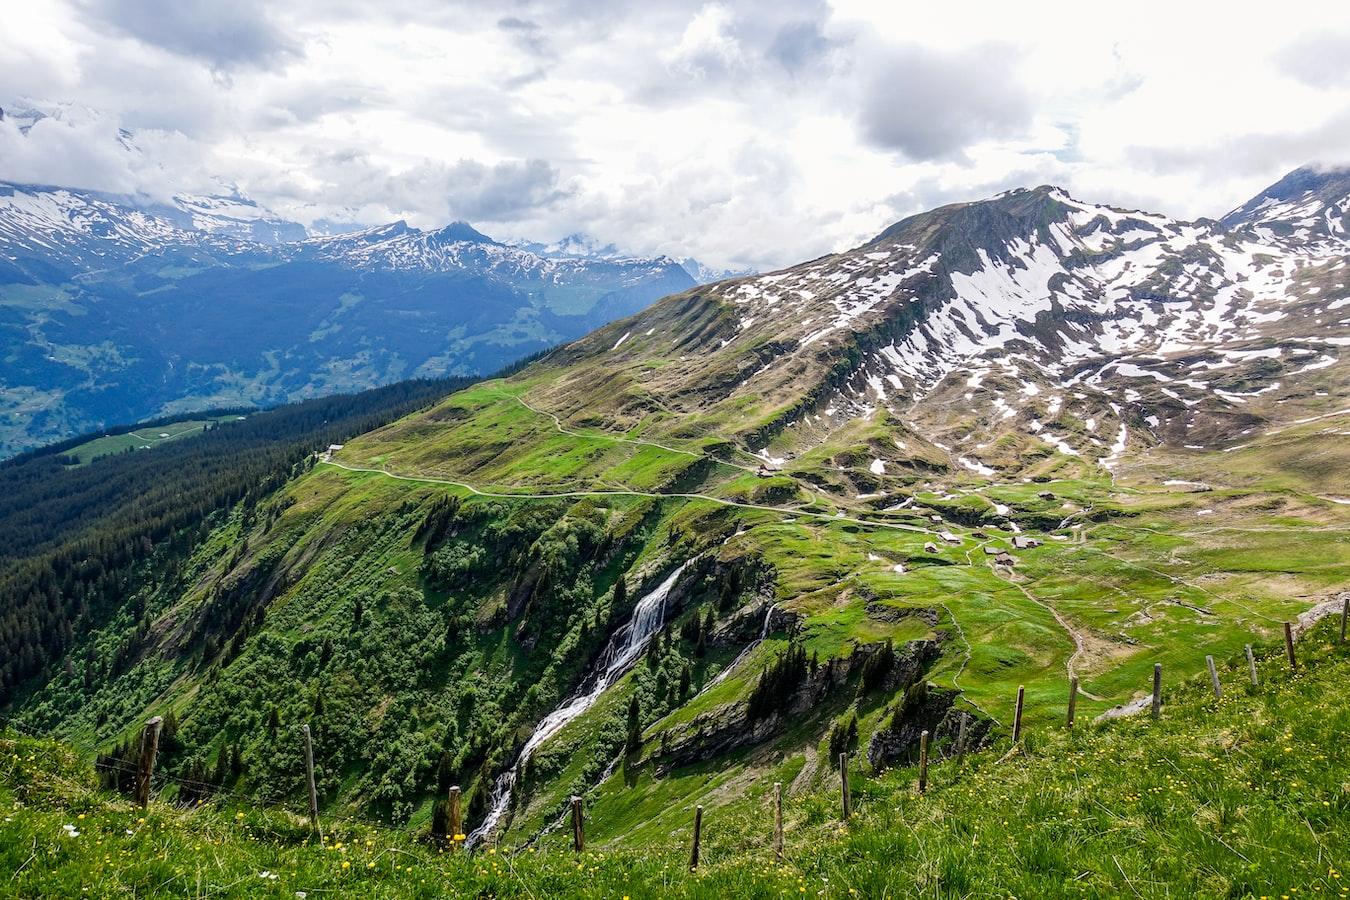 view of mountain and a waterfall near Interlaken, Switzerland